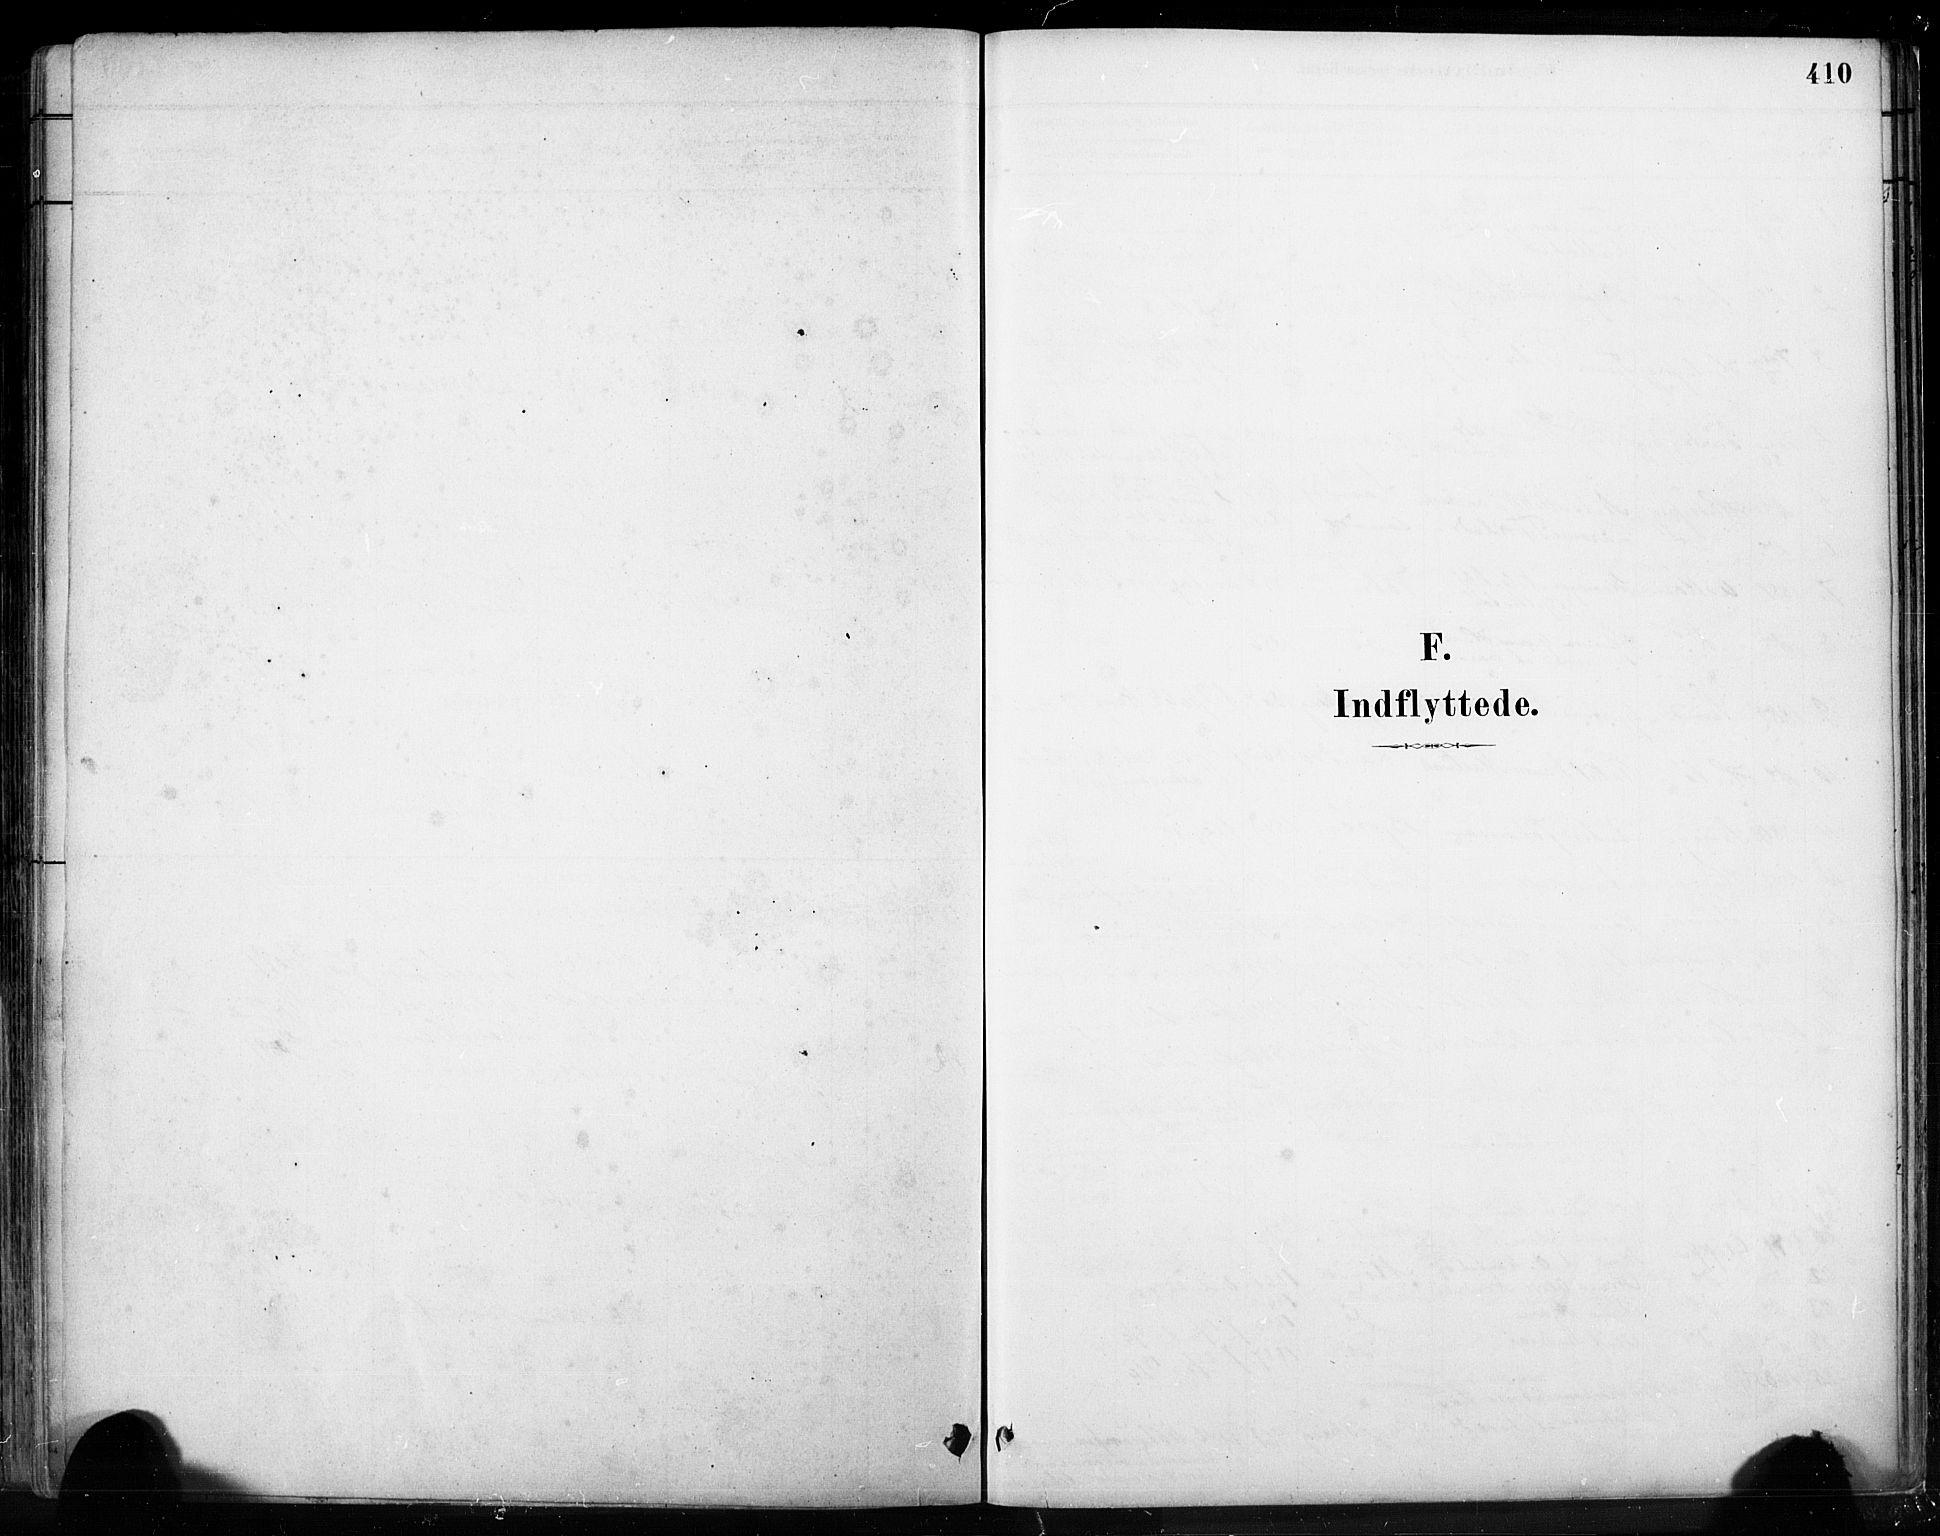 SAB, Fjell sokneprestembete, H/Hab: Klokkerbok nr. A 4, 1880-1899, s. 410